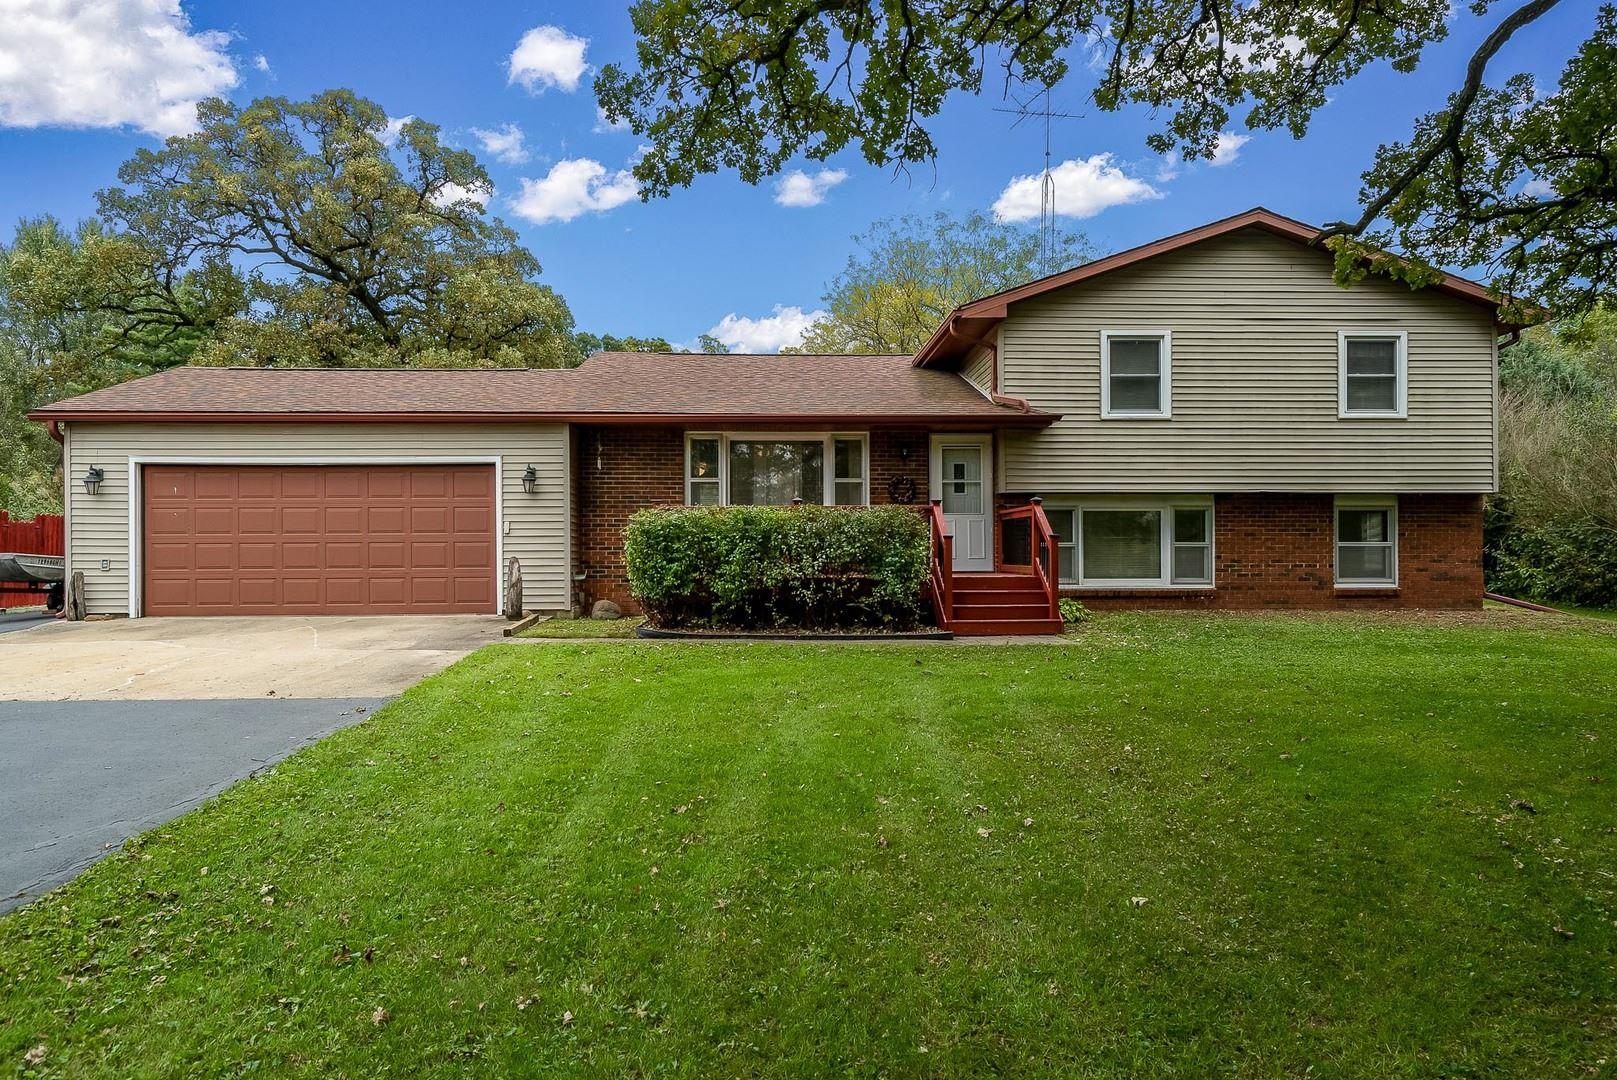 108 Woodland Drive, Dixon, IL 61021 - #: 10550330